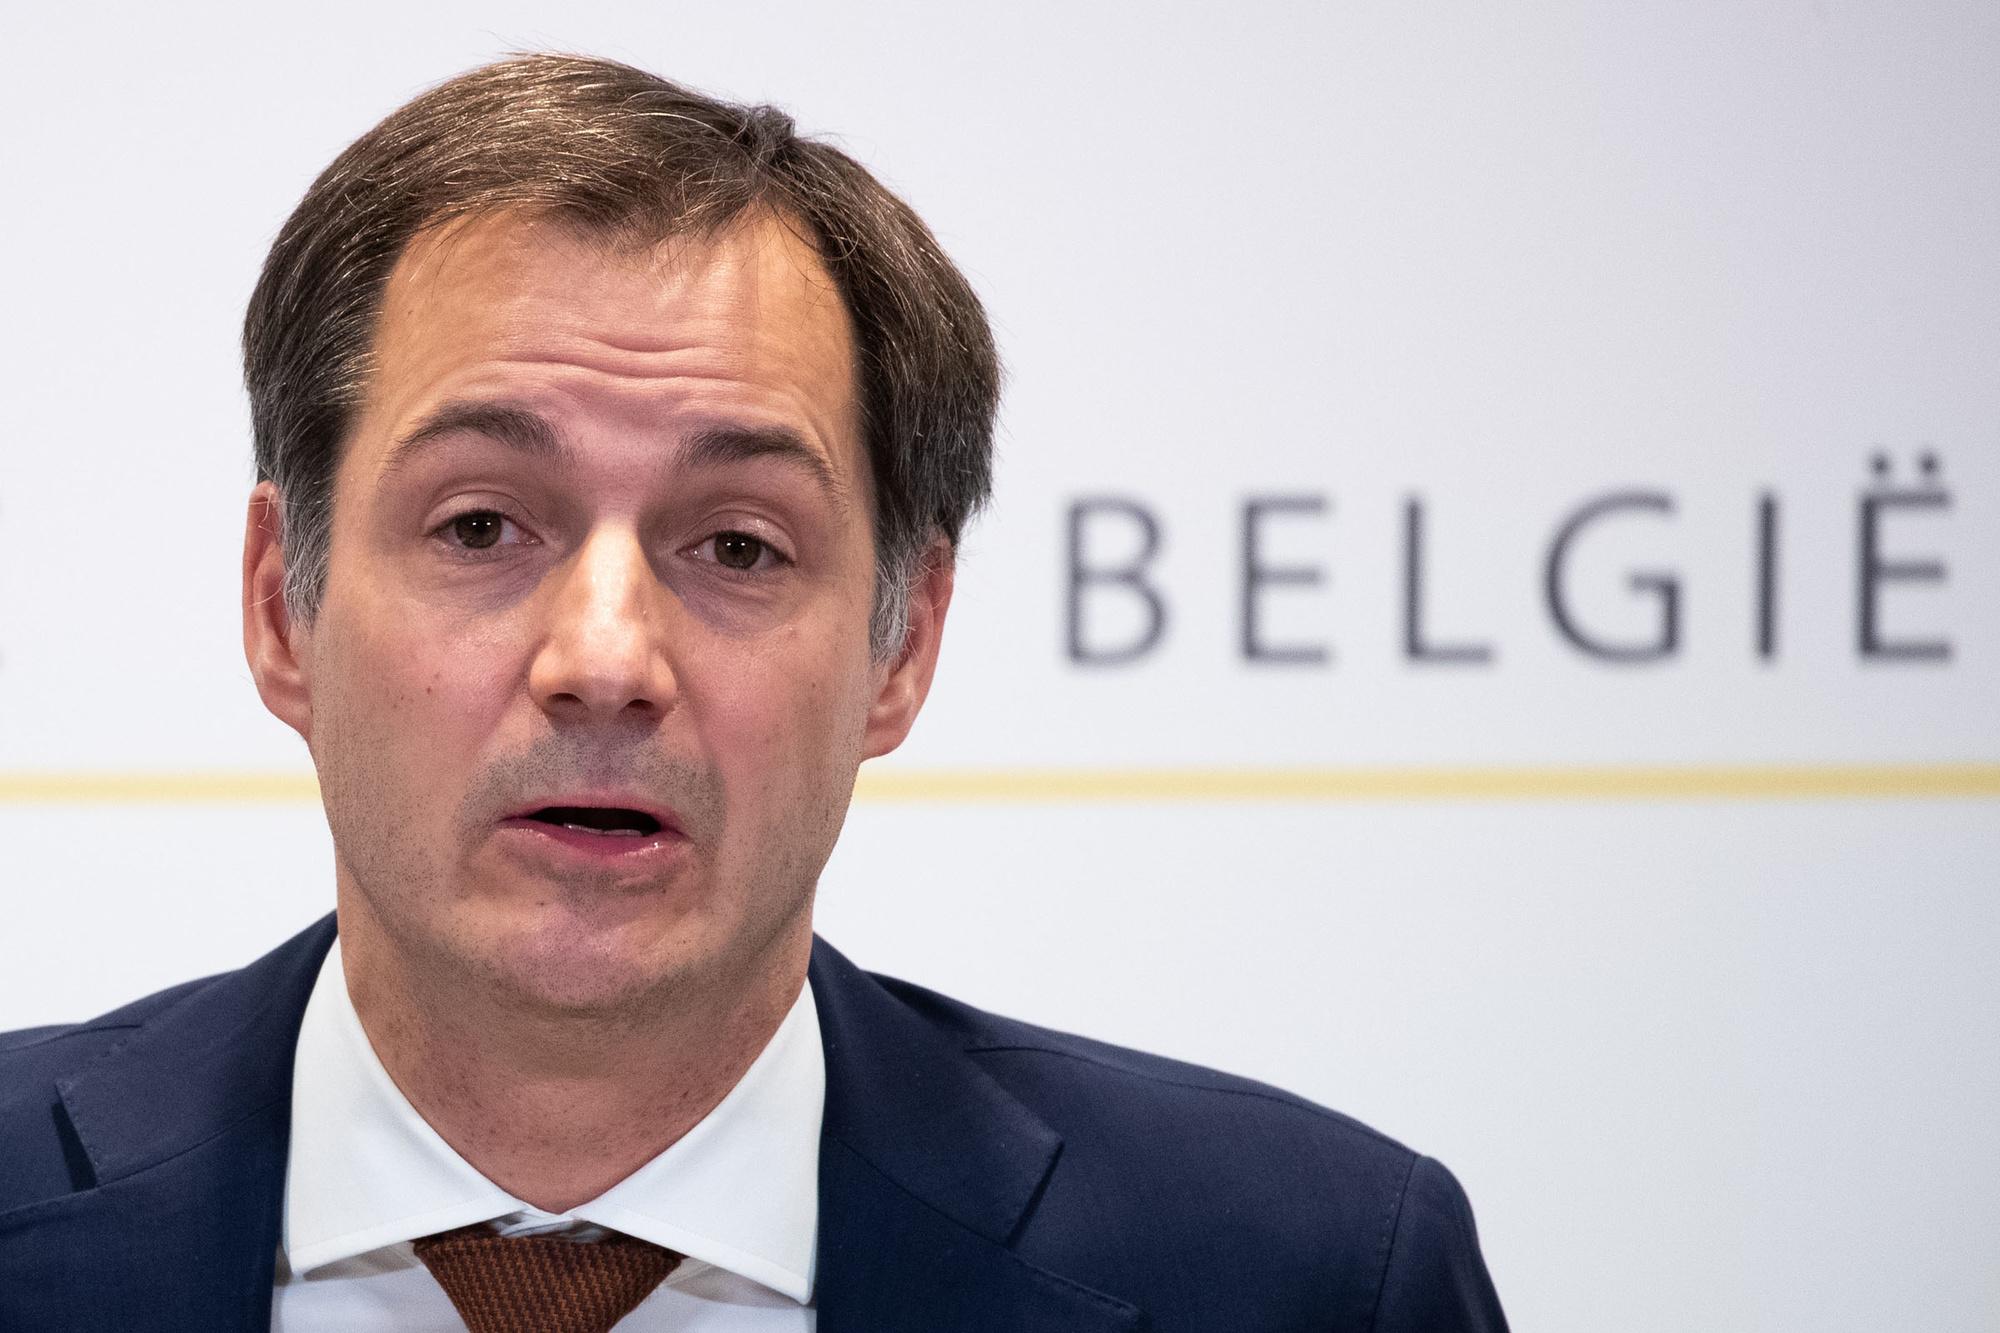 Belga Image